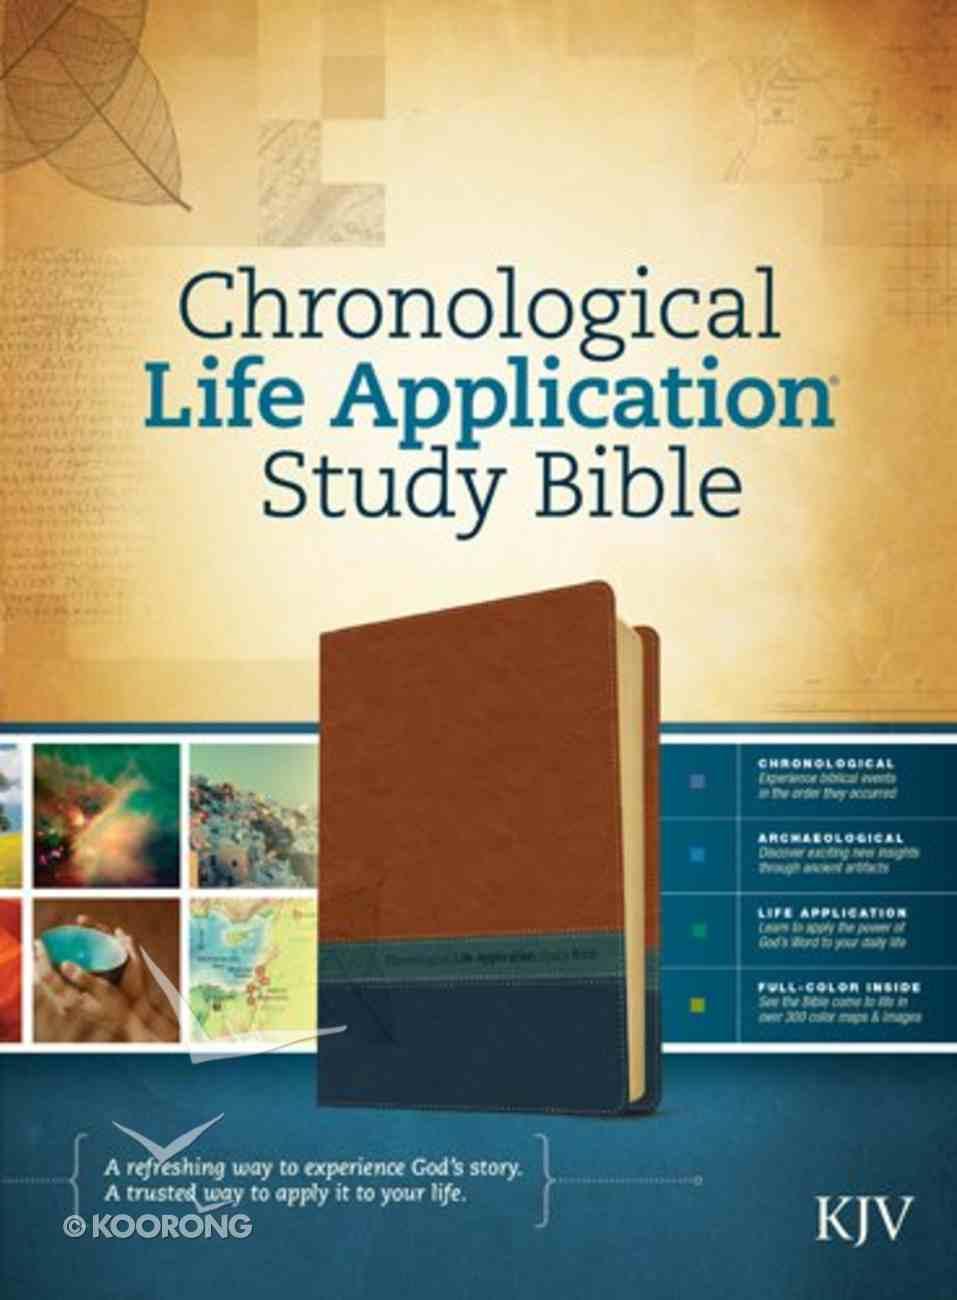 KJV Chronological Life Application Study Bible Brown/Dark Teal/Blue Imitation Leather